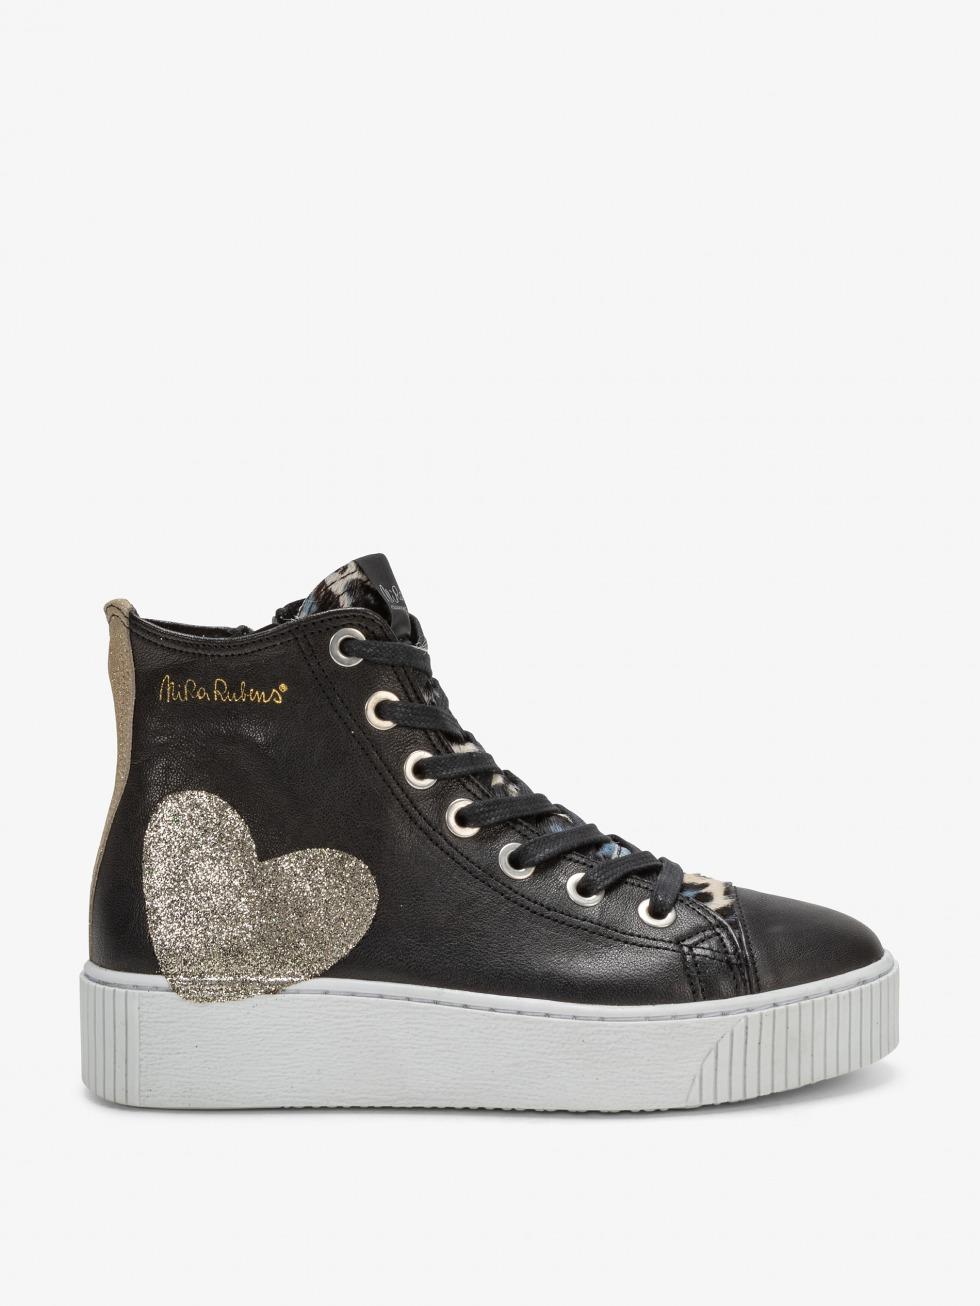 Long Island Sneakers - Jungle Dark Heart